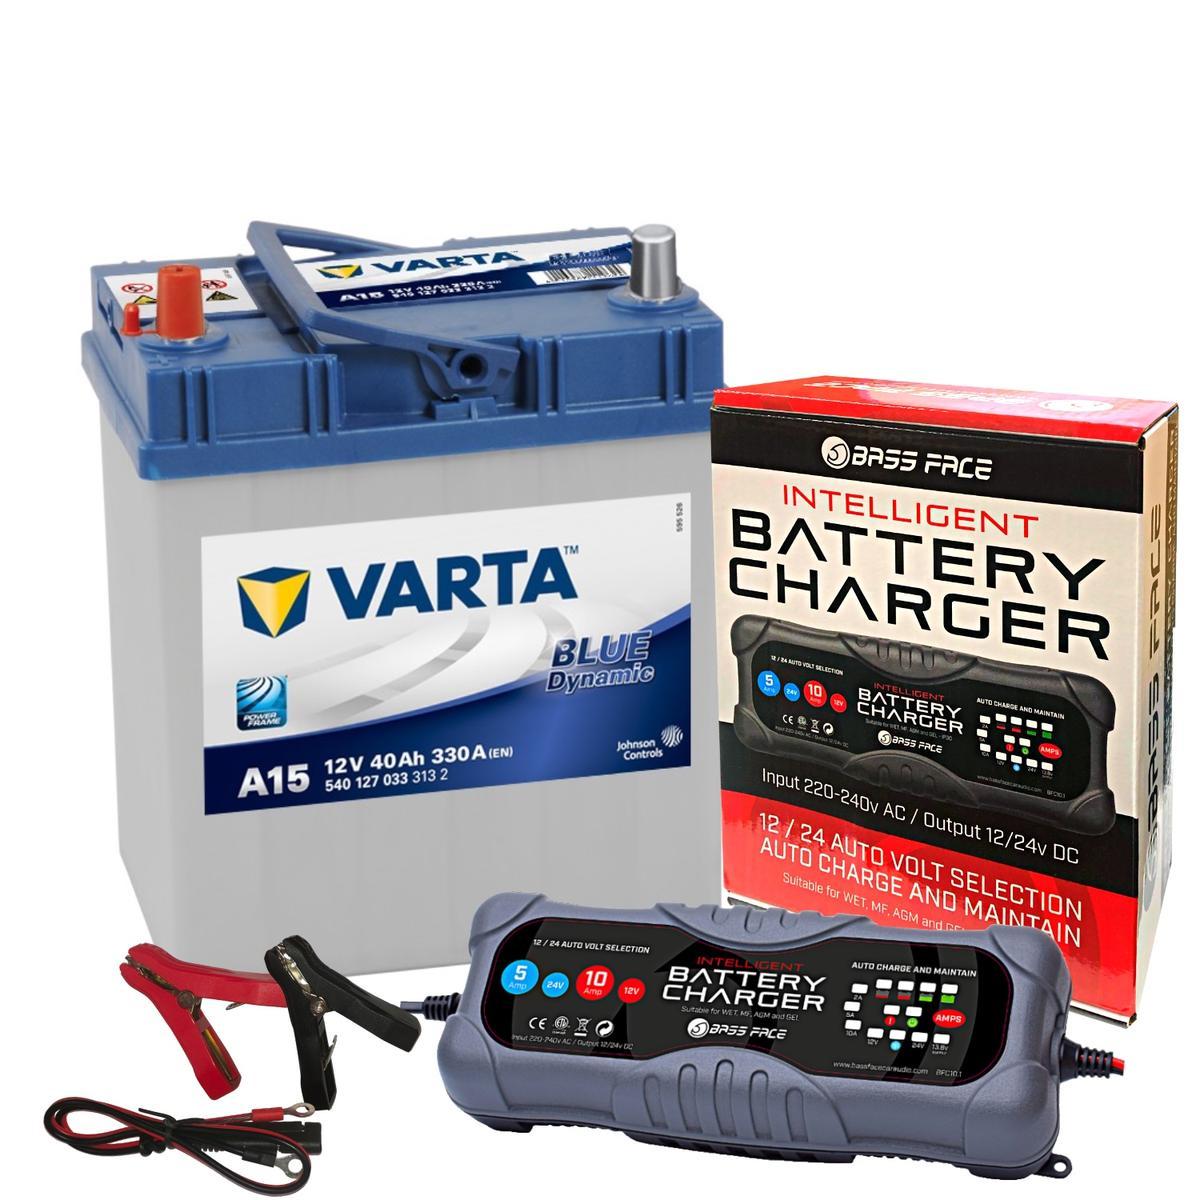 Varta A15 Suzuki Toyato Car Battery 12v 4 Year 055 40Ah 330CCA W/ 10 Amp Charger